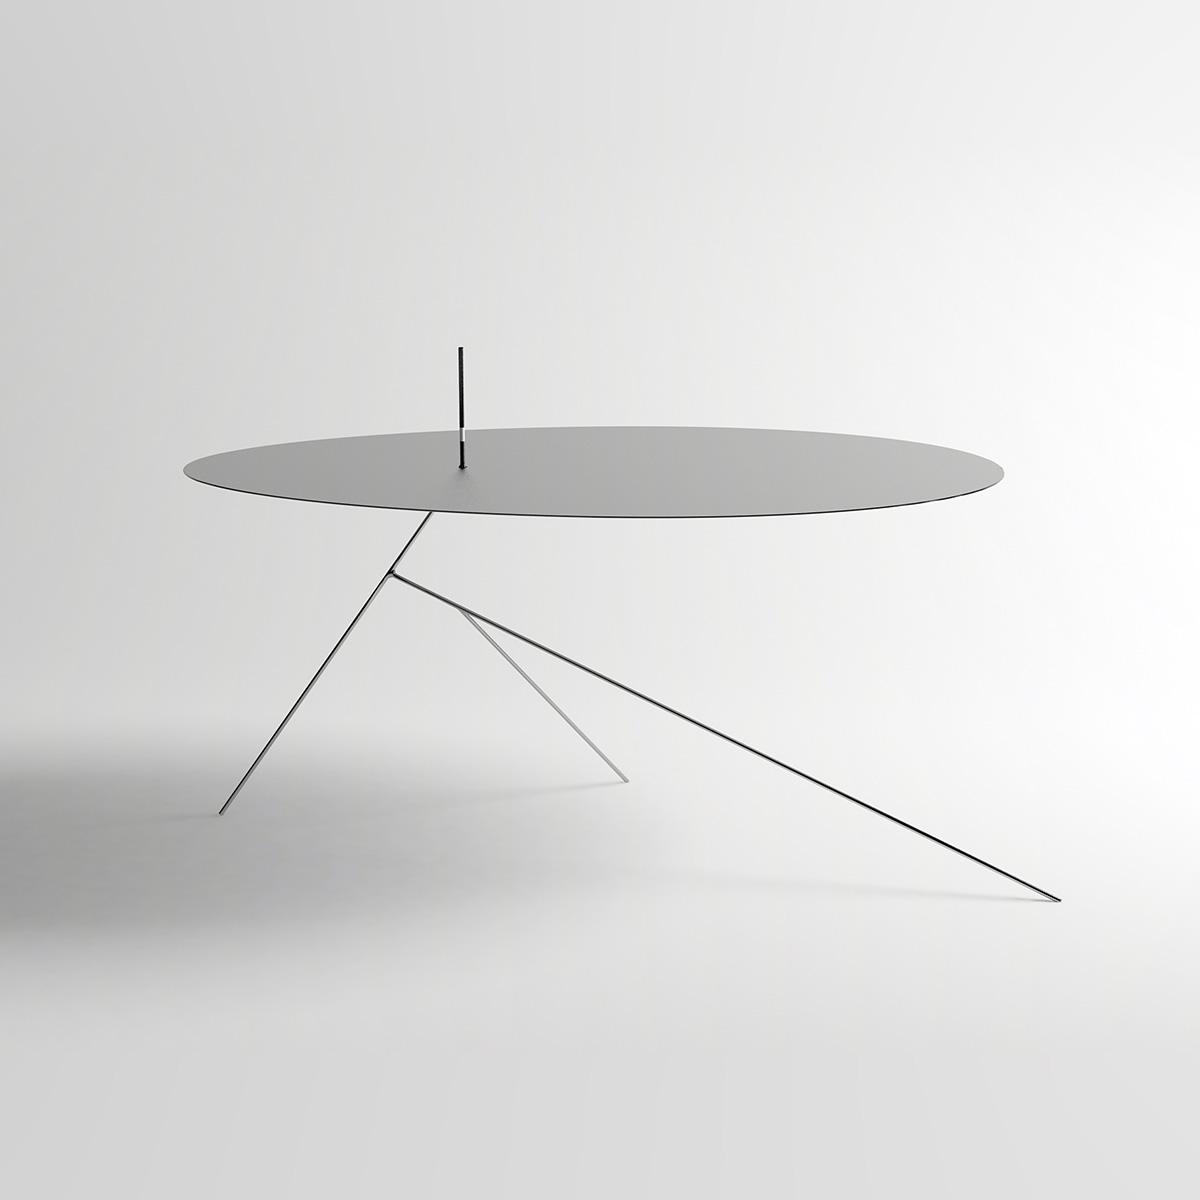 04-mesa-chieut-jay-design